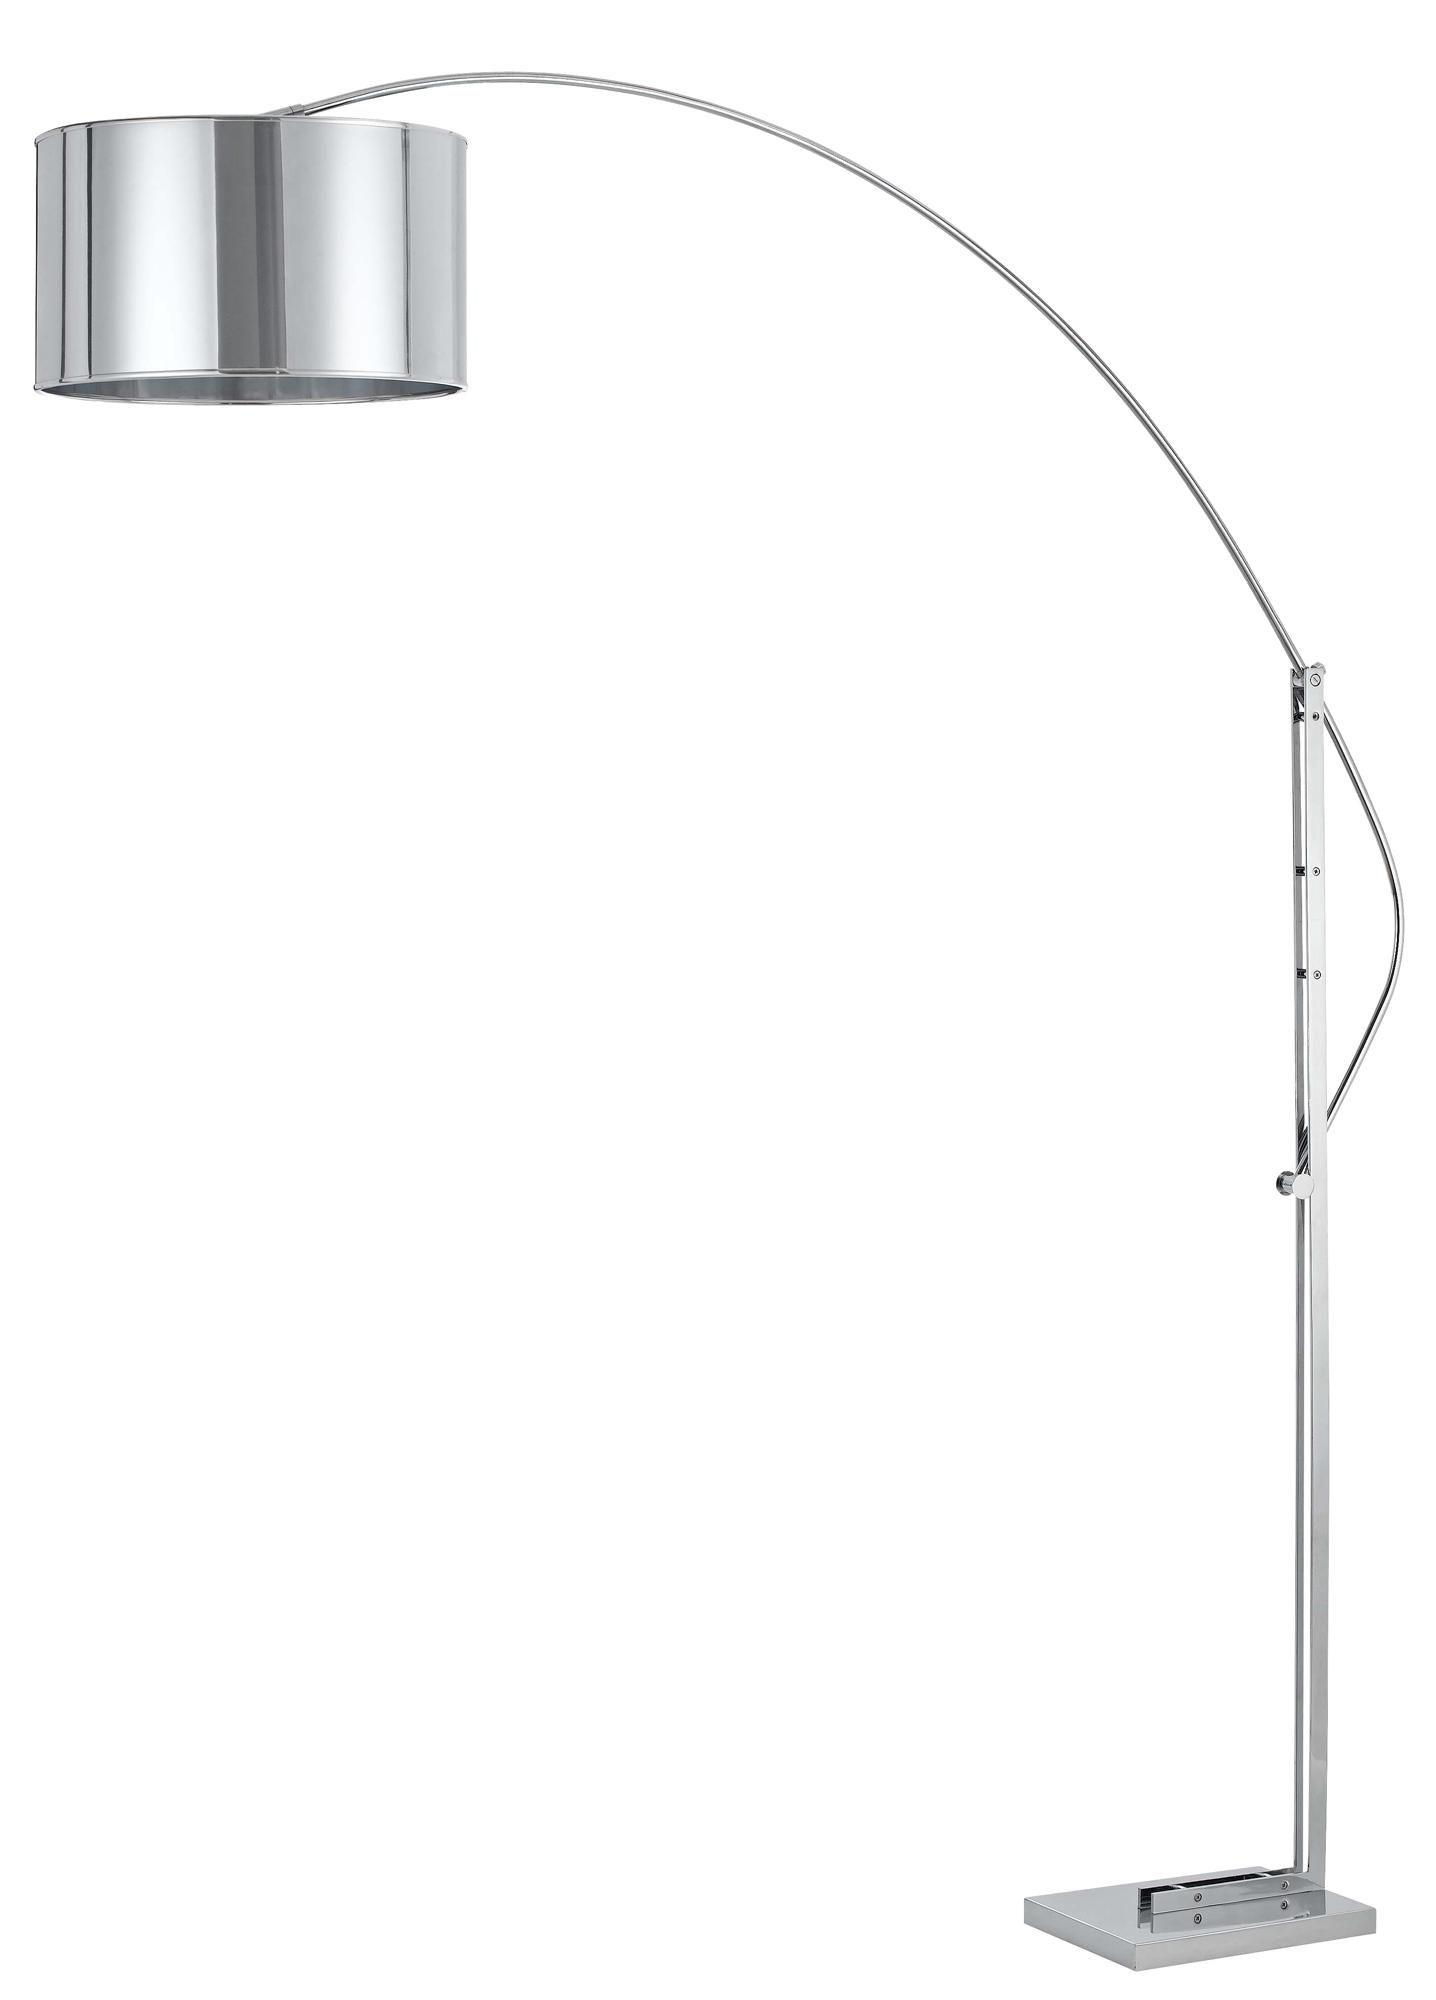 cristophe chrome adjustable arc floor lamp diiferent lamp shade brentwood residence. Black Bedroom Furniture Sets. Home Design Ideas